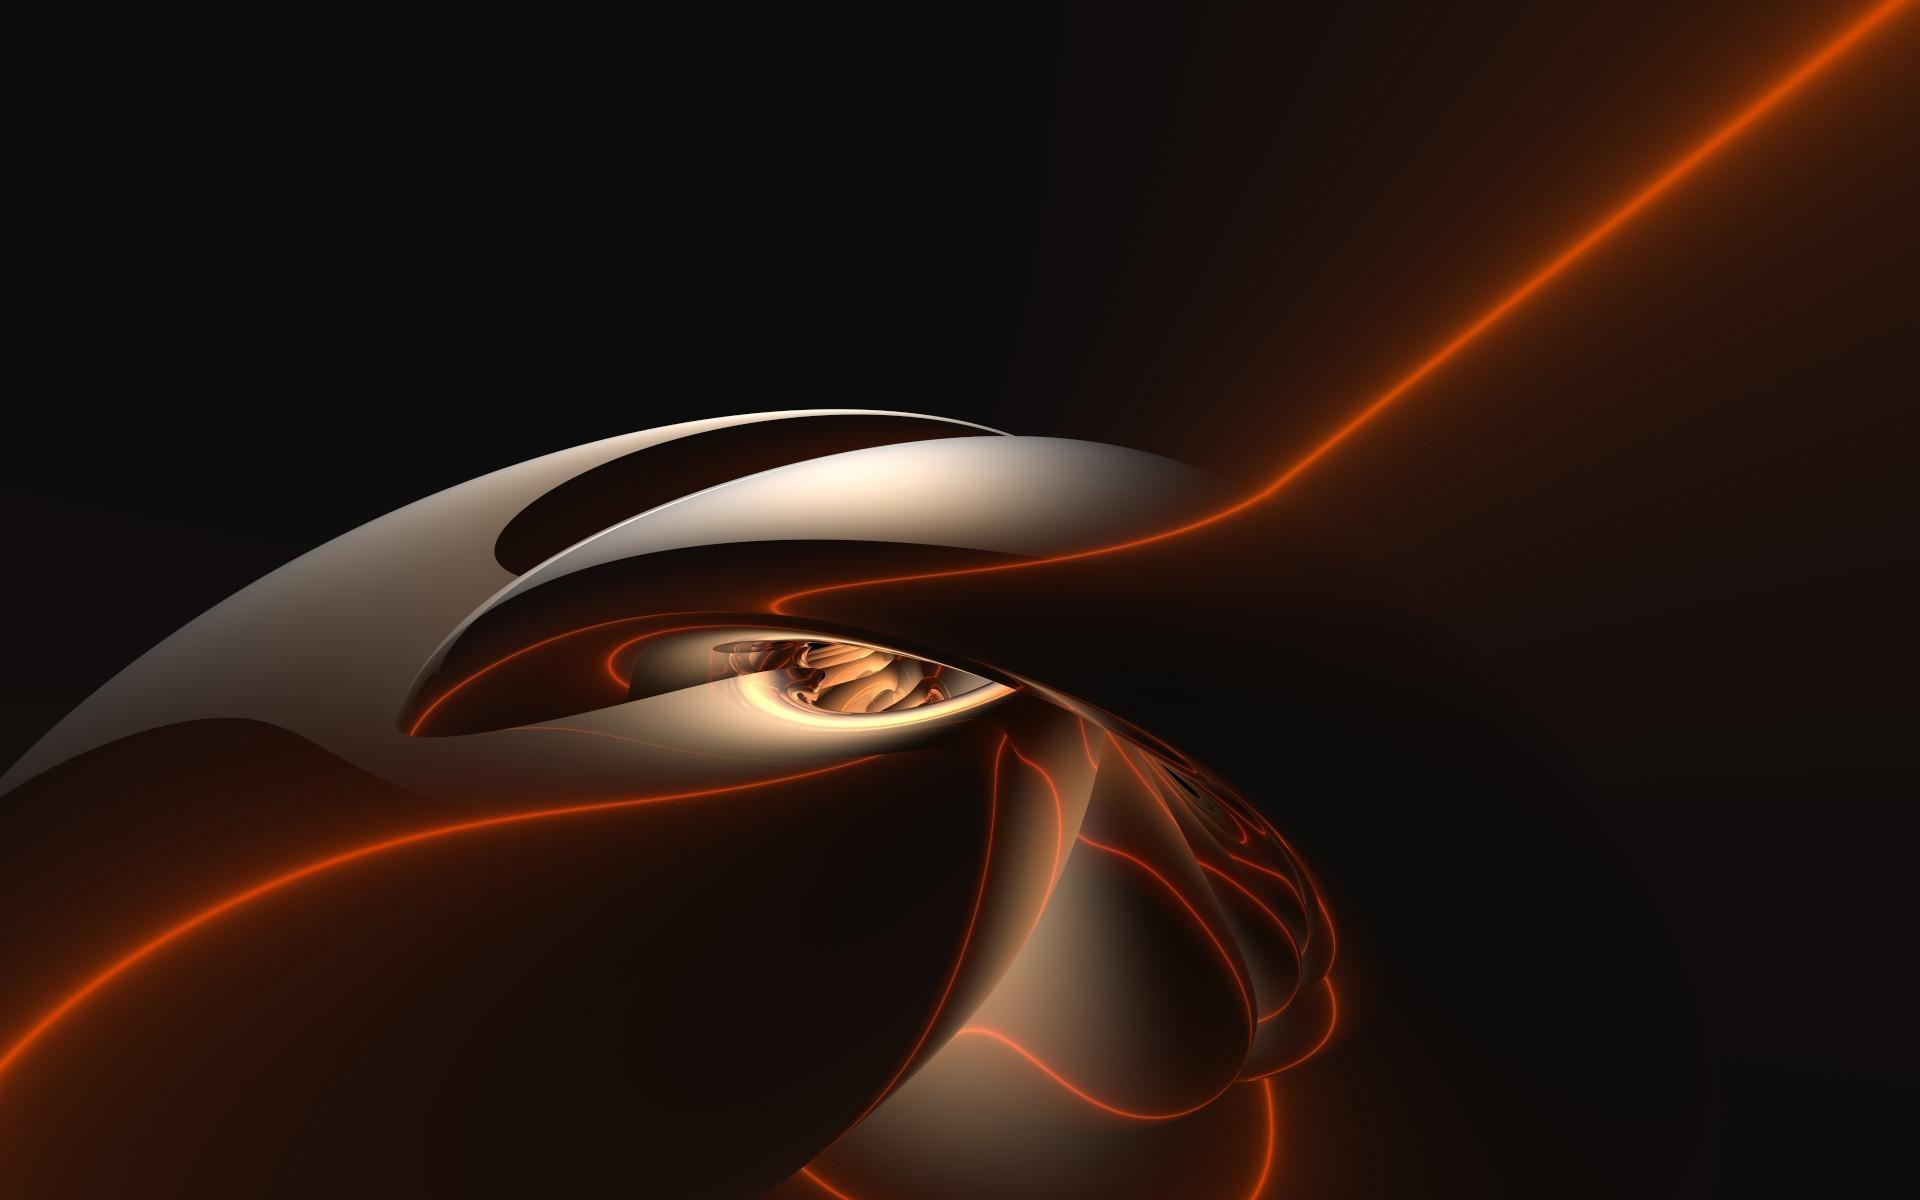 desktop background orange abstract - photo #26